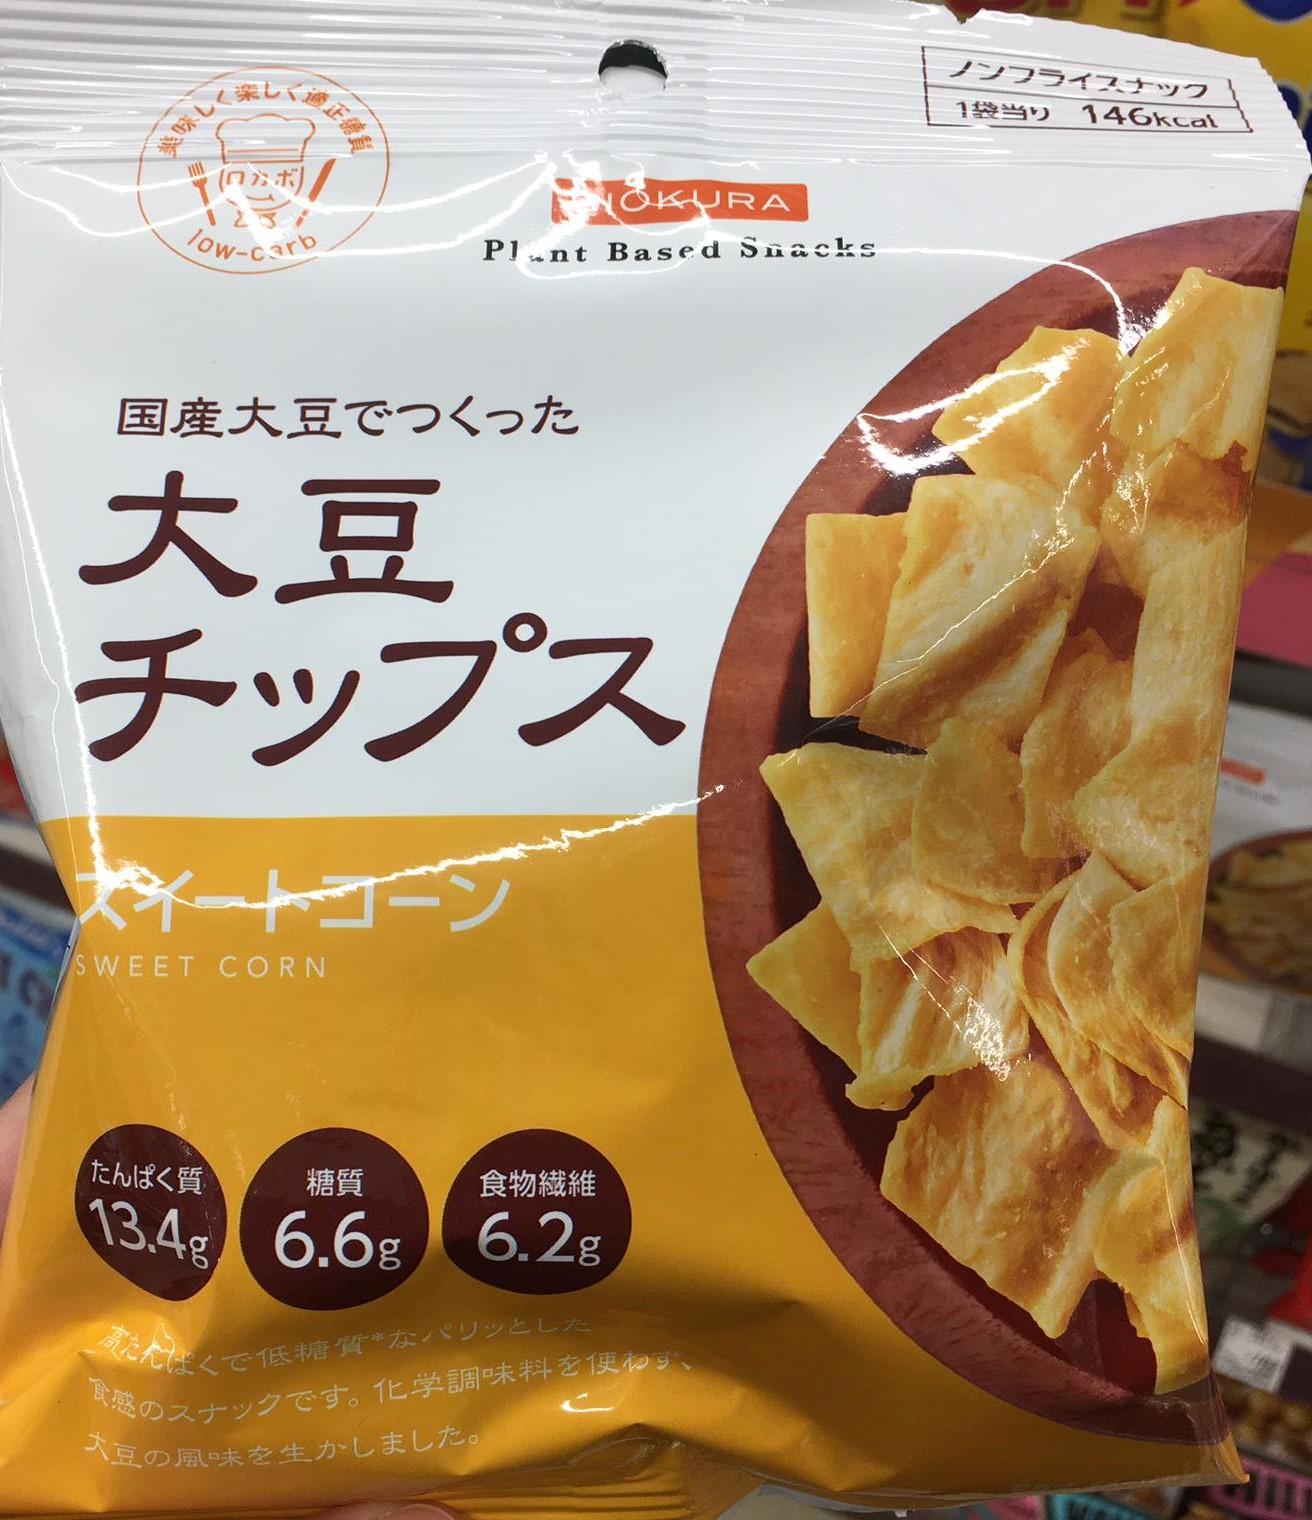 Biokura Soybean Chips, Sweet Corn